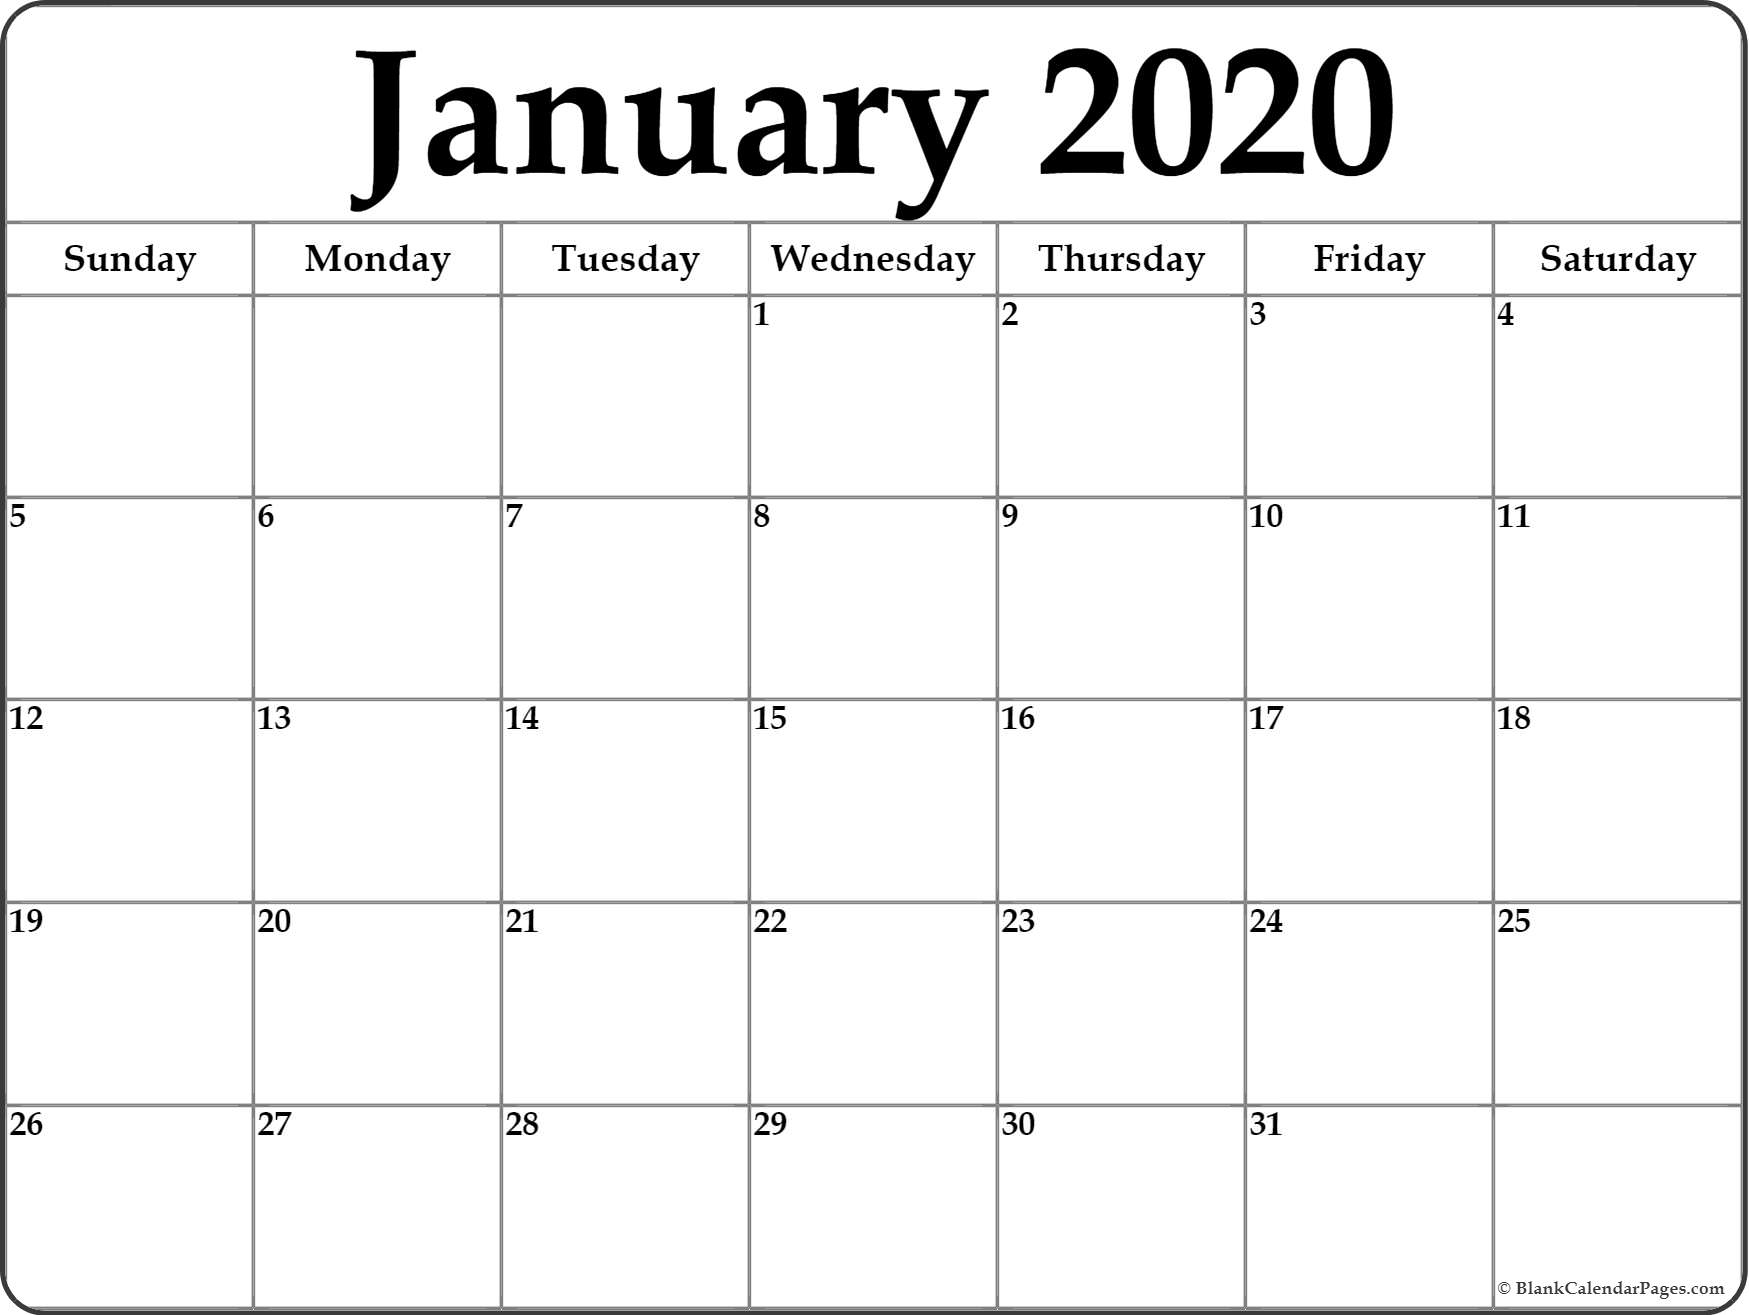 January 2020 Calendar | Free Printable Monthly Calendars in Free Printable Fill In Calendars 2020